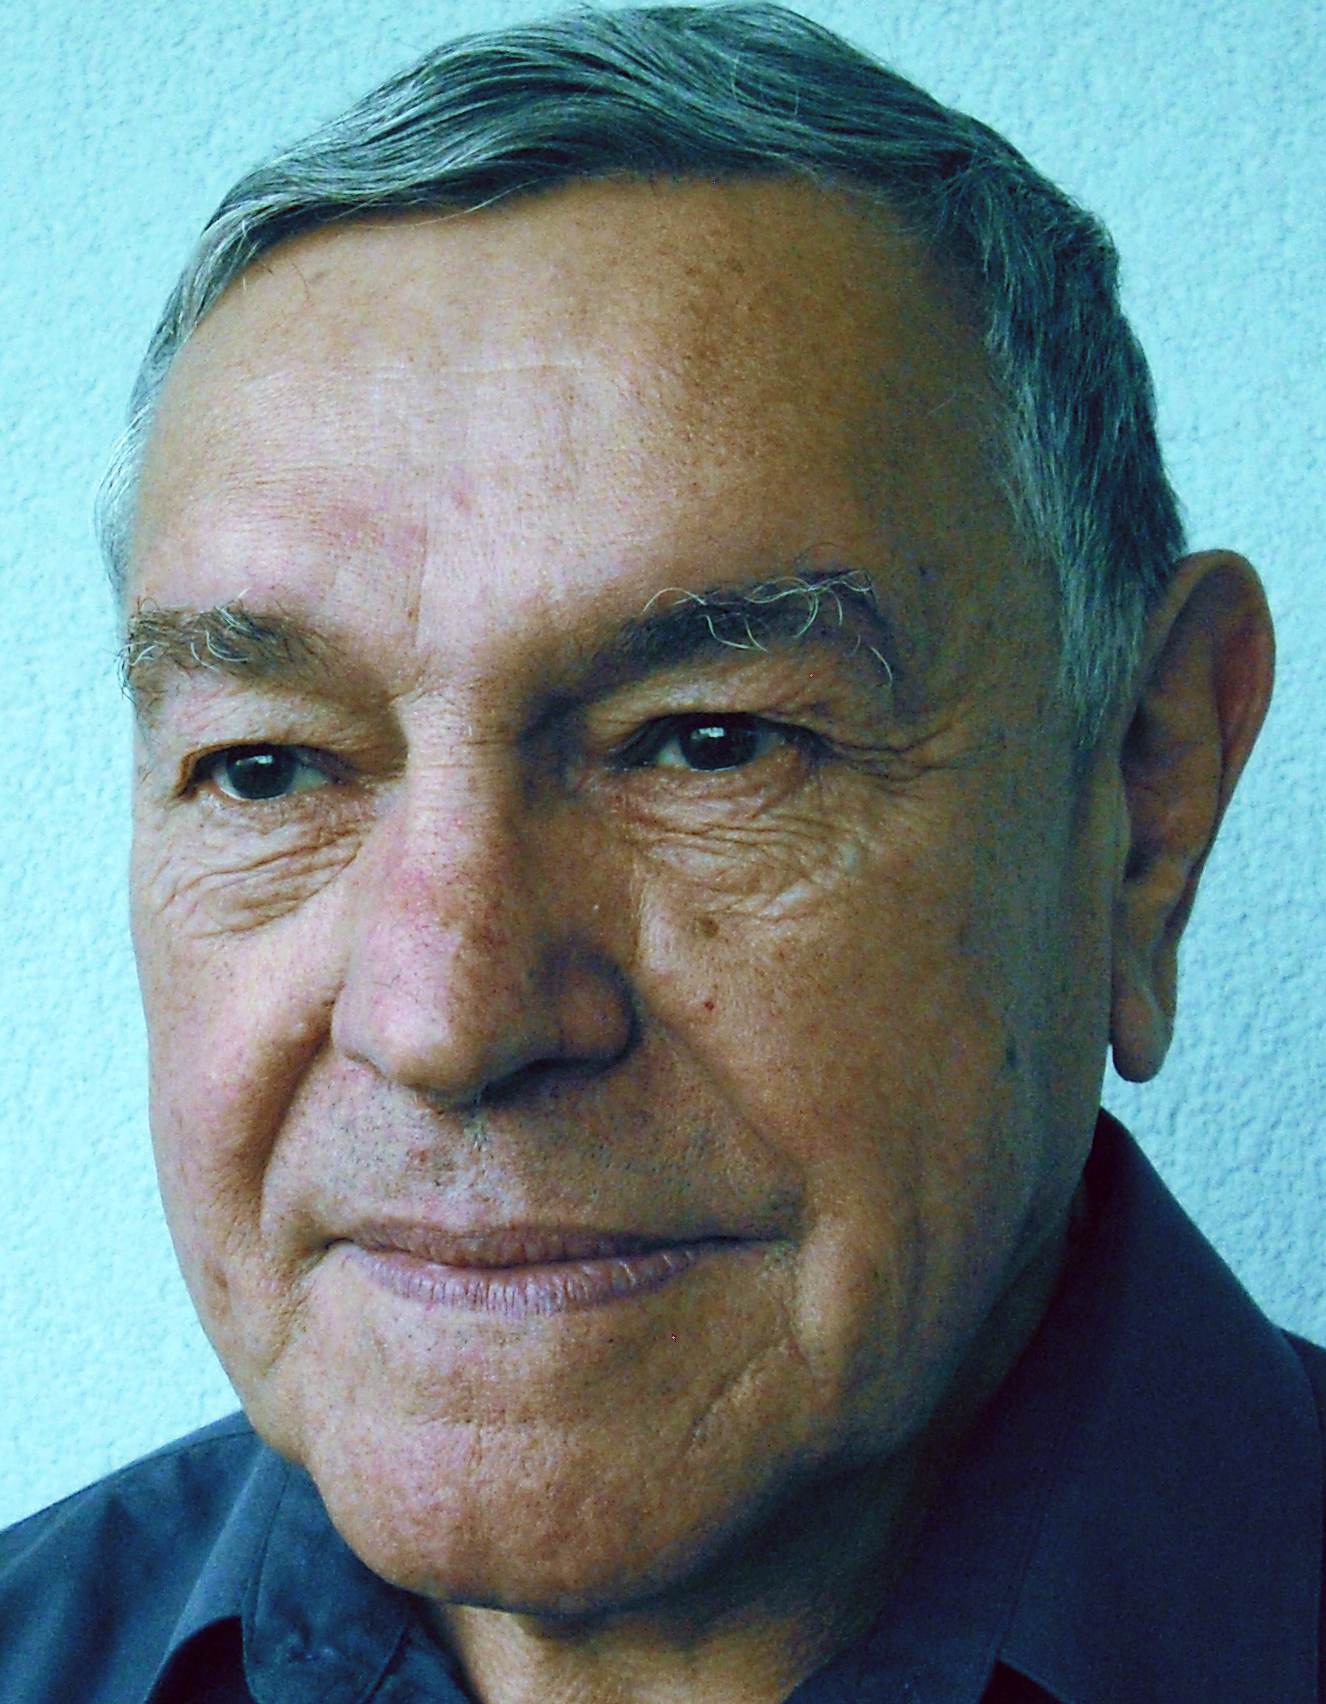 Miroslav Vaic